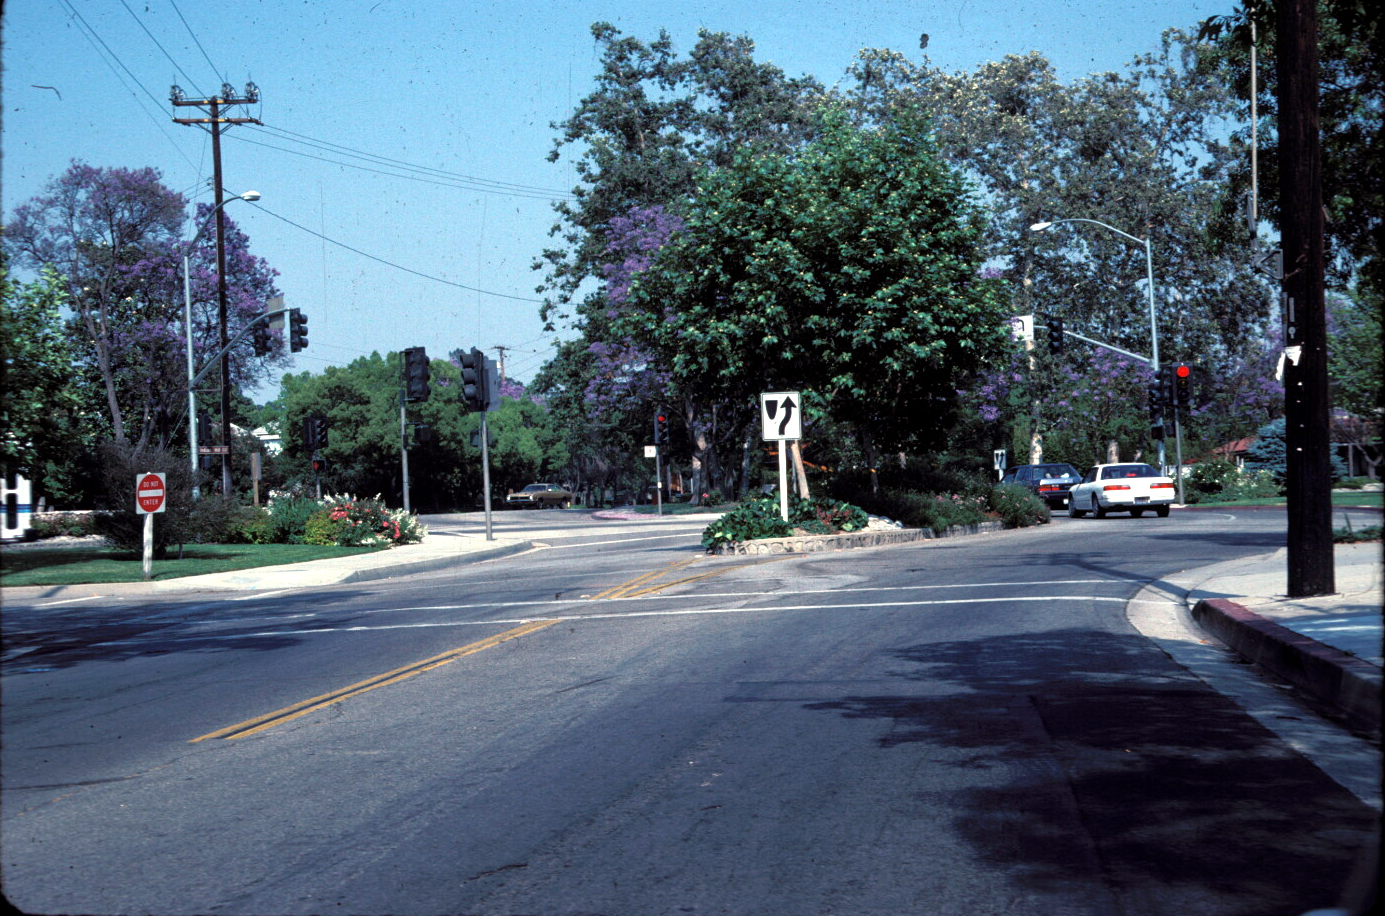 Claremont California traffic slowing diverter